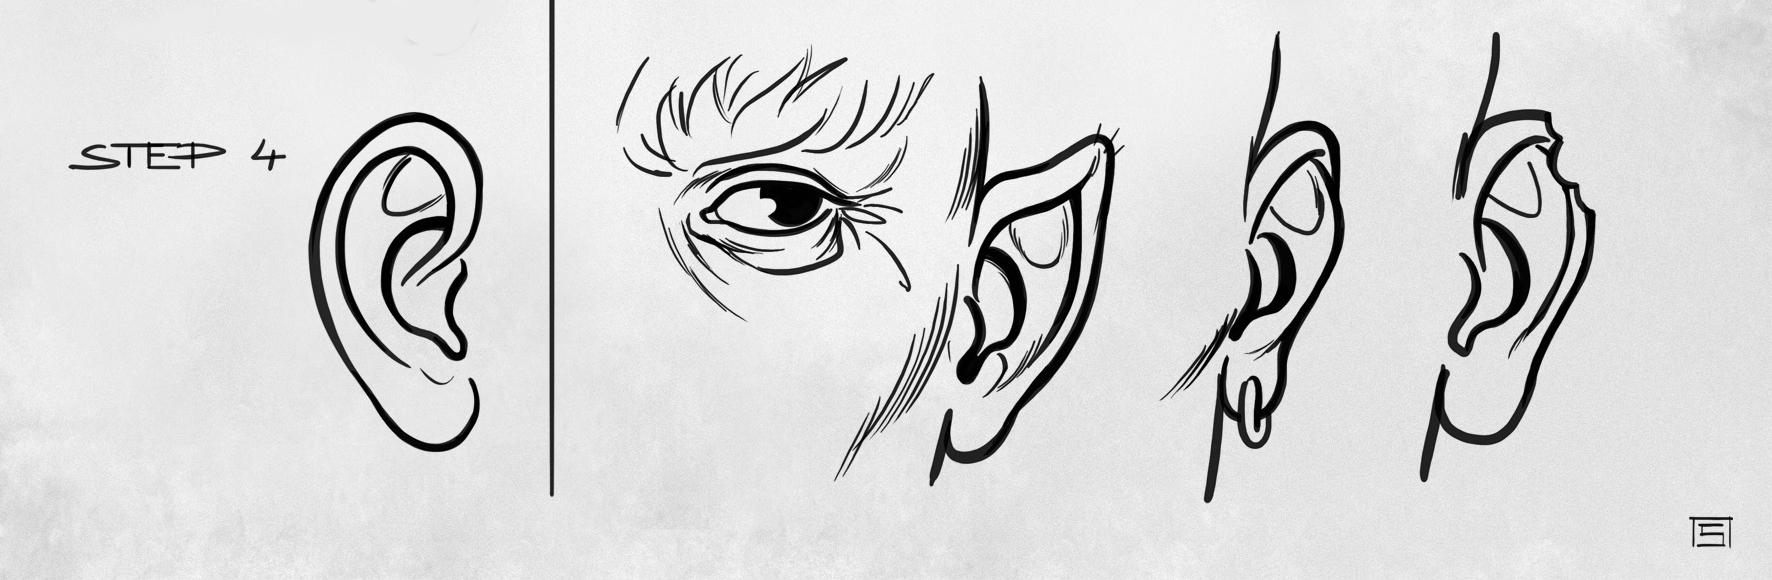 How To Draw A Comic Look Human Ear Free3dtutorials Com